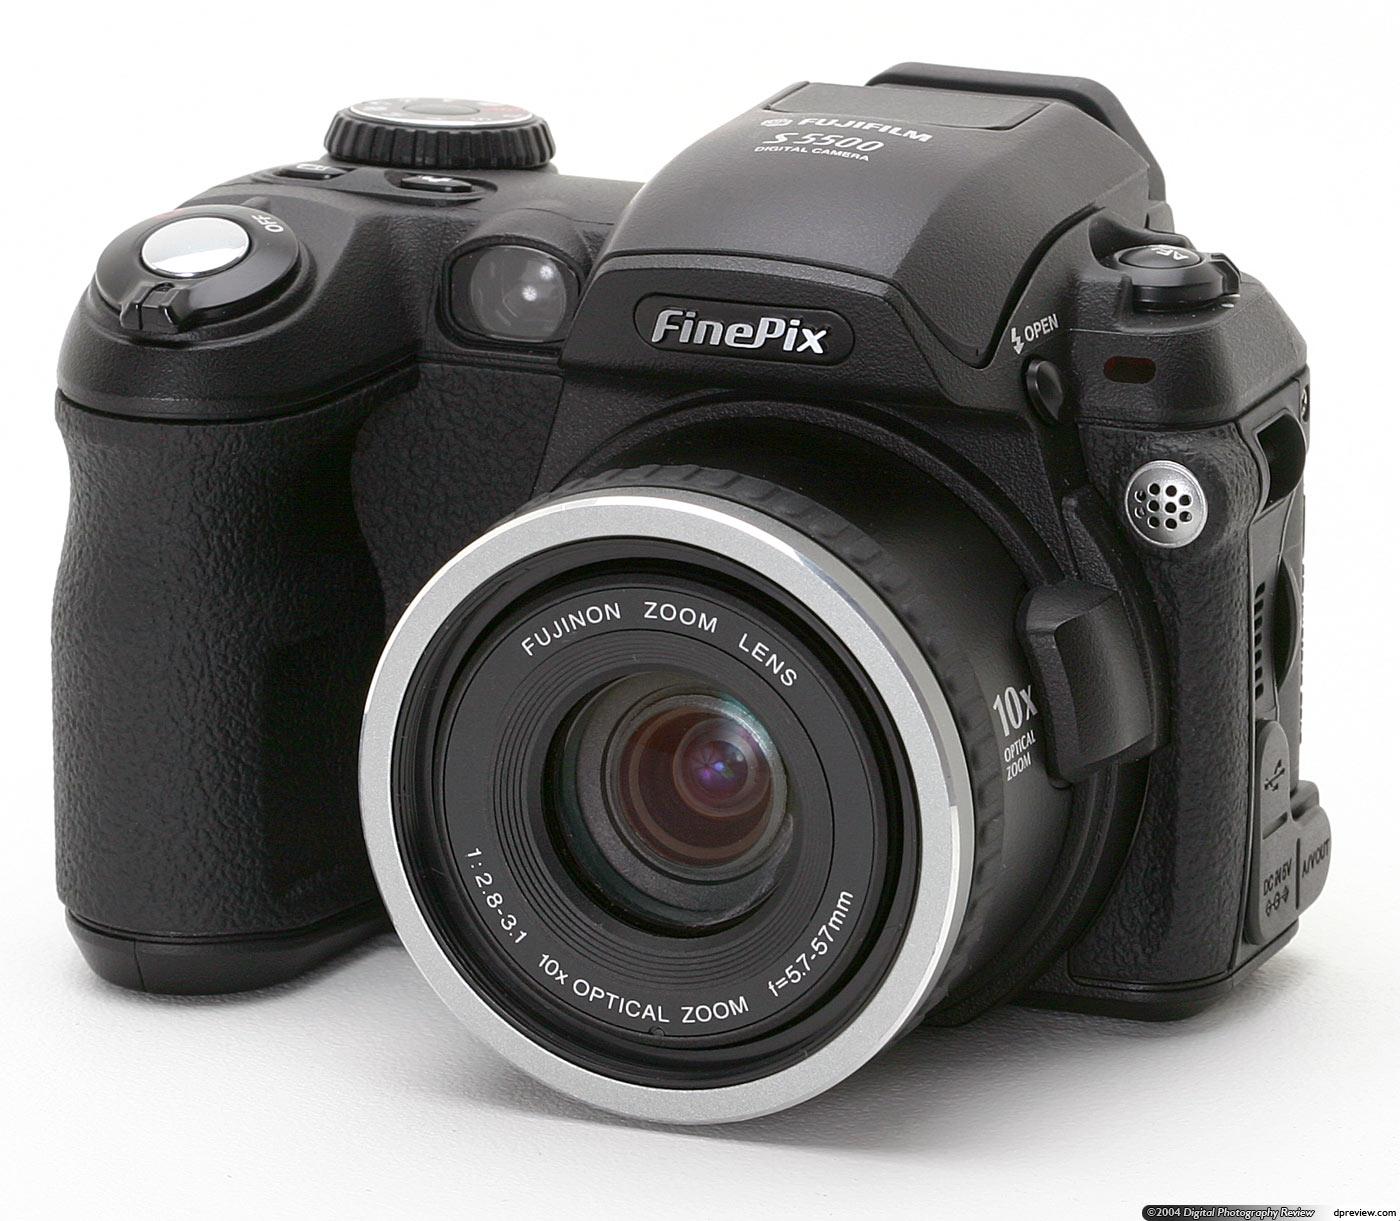 Fujifilm FinePix S5100 / S5500 Review: Digital Photography ...